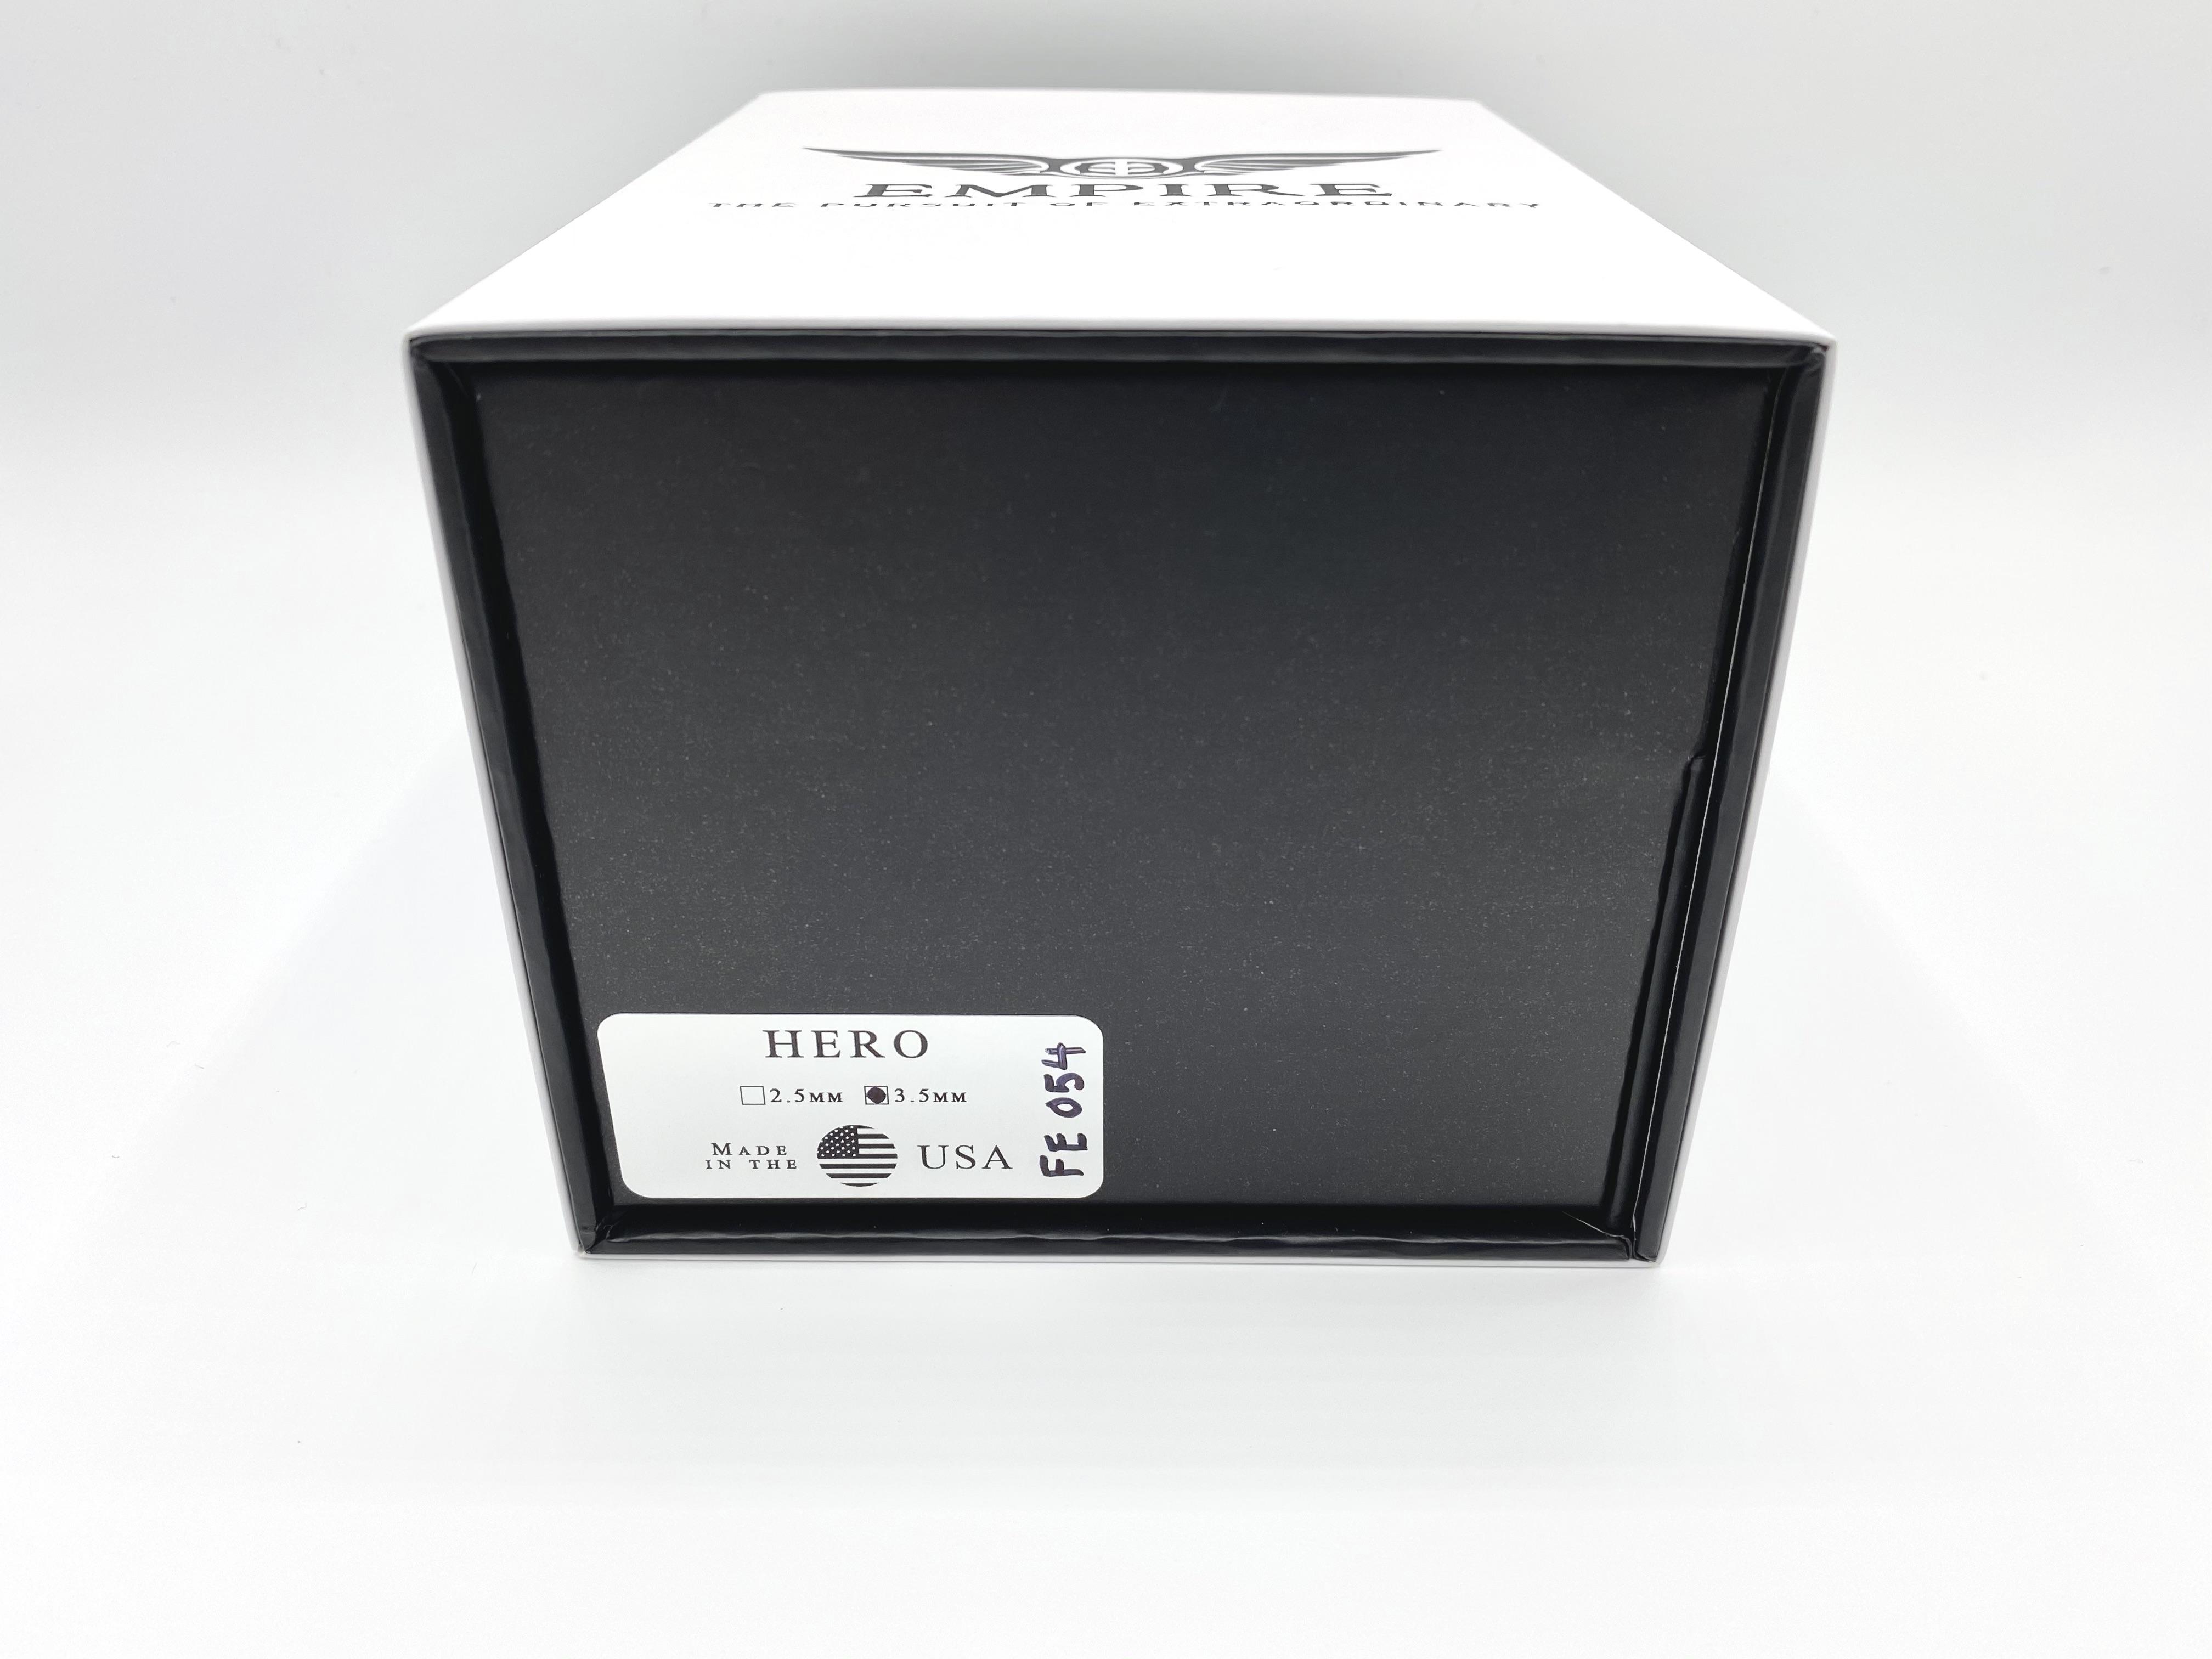 Box Image 2.jpg